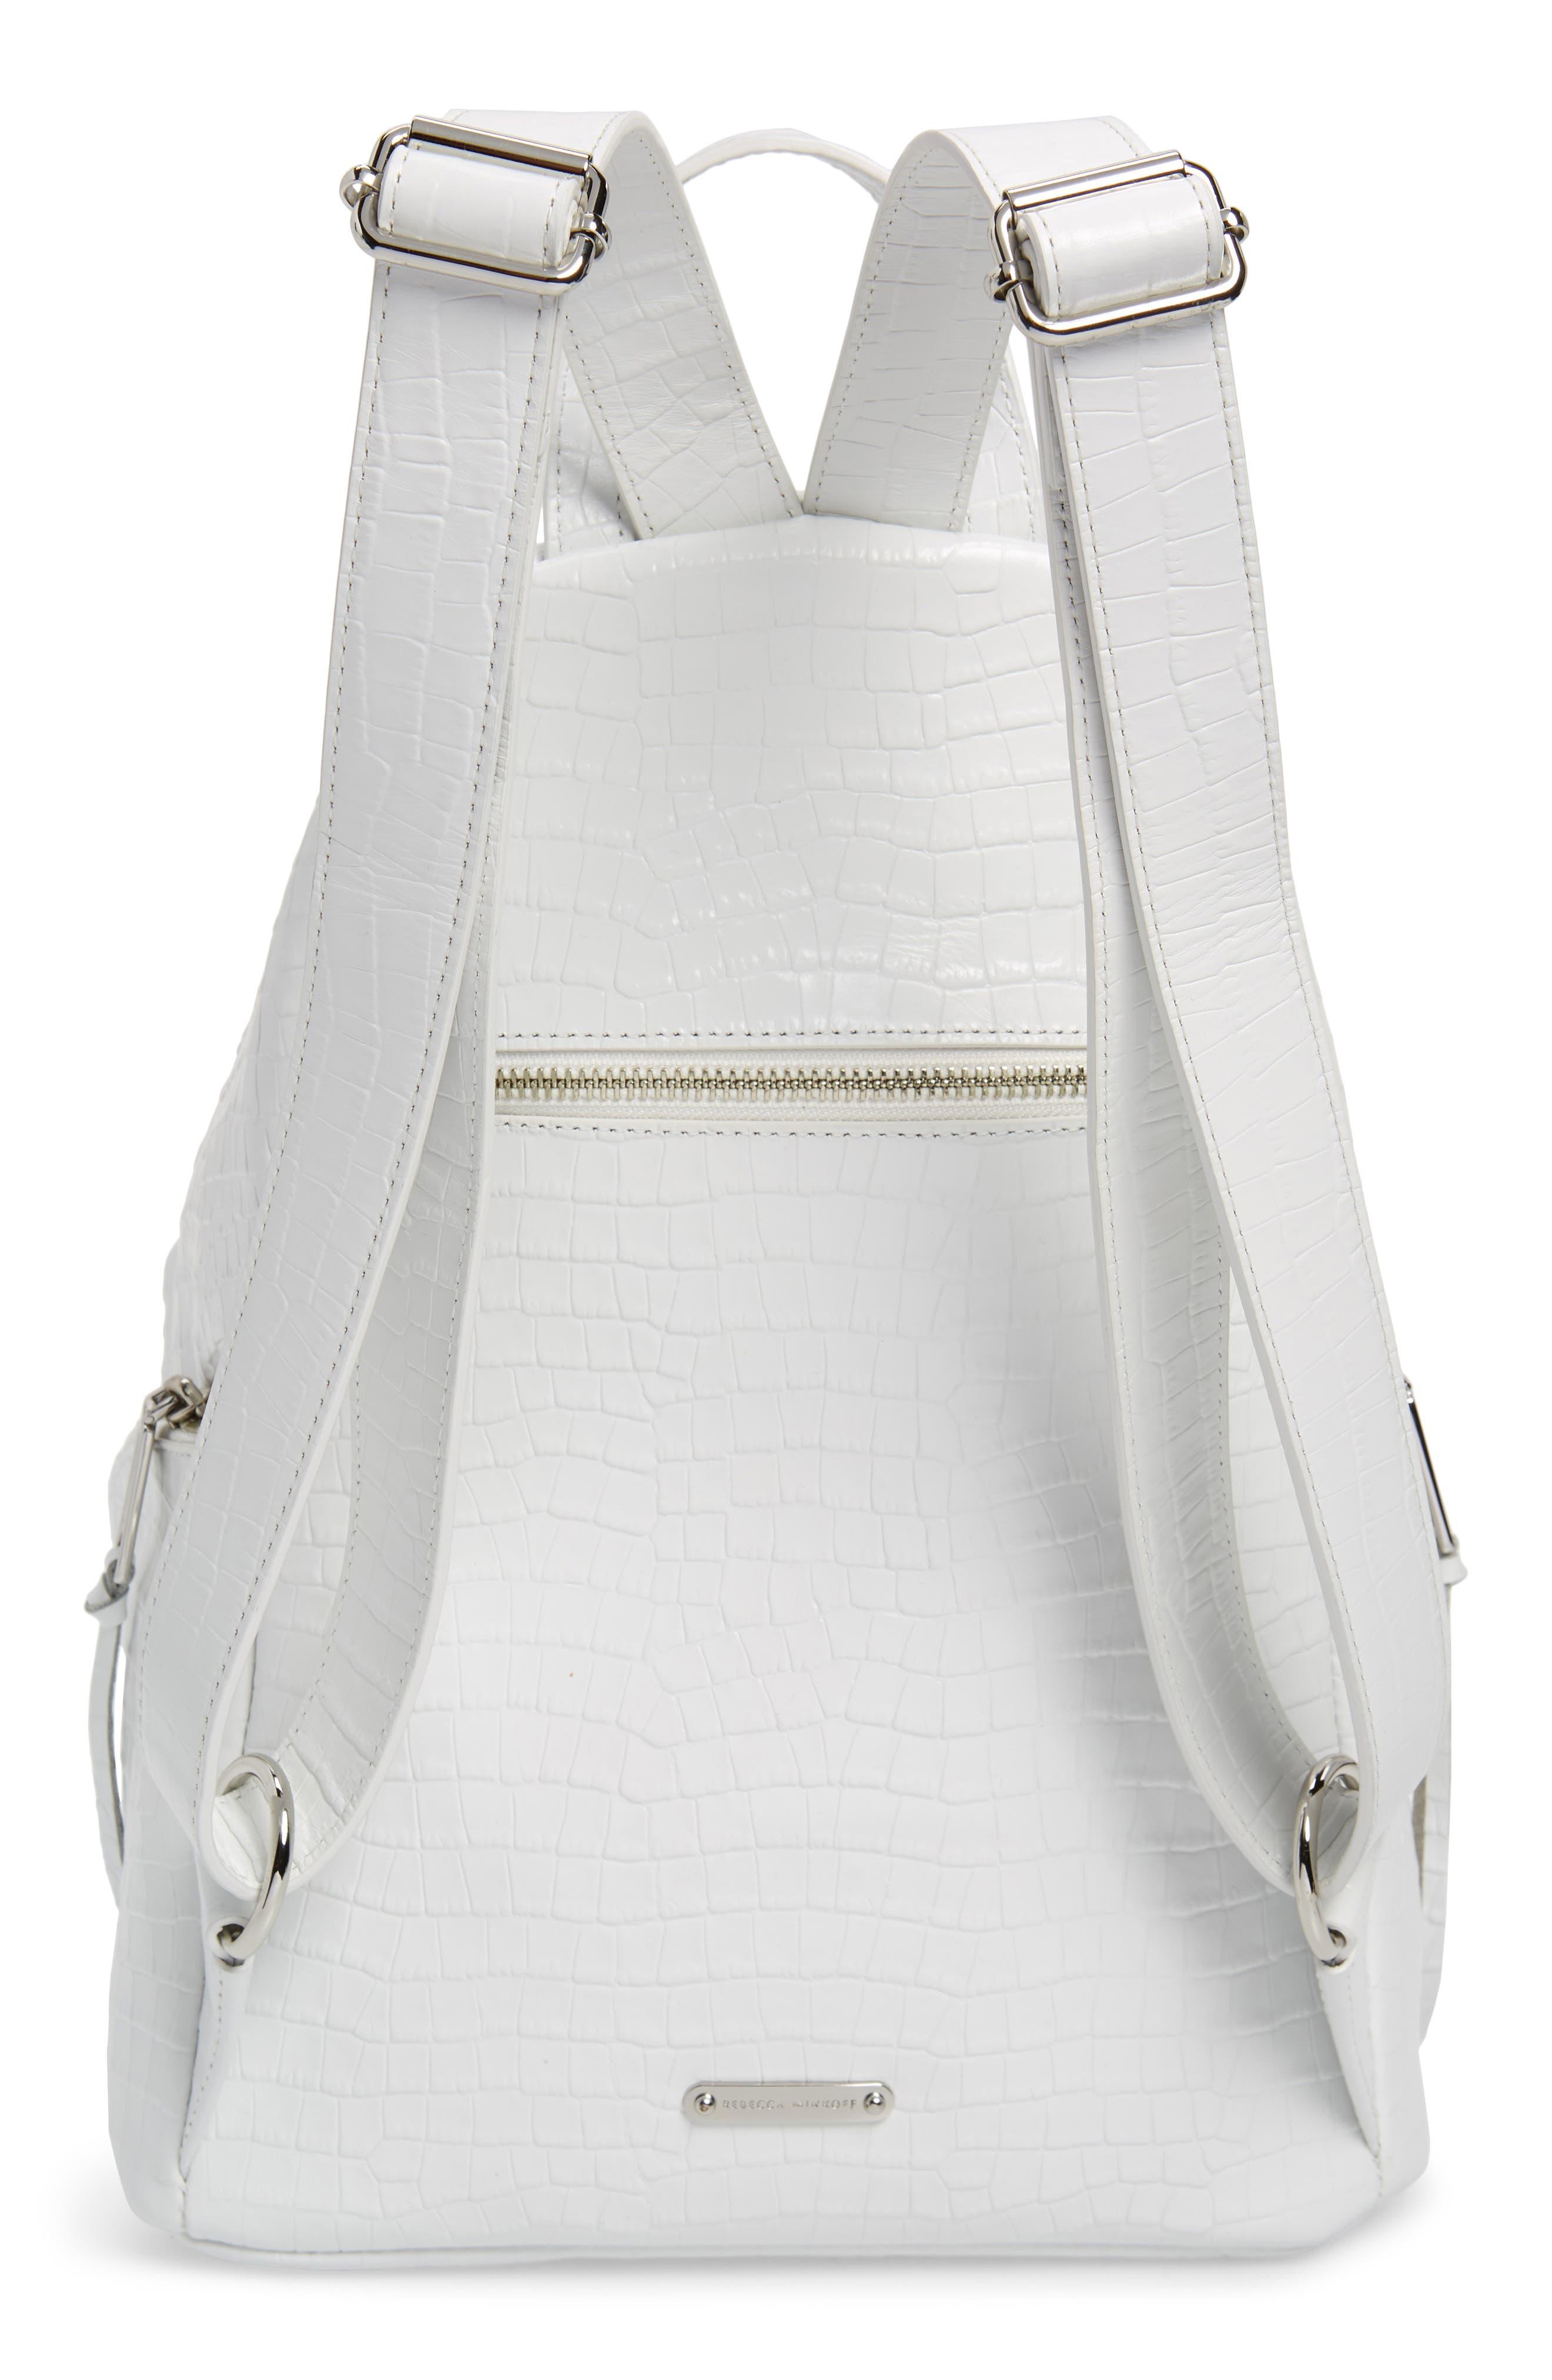 REBECCA MINKOFF, Julian Croc Embossed Leather Backpack, Alternate thumbnail 3, color, OPTIC WHITE